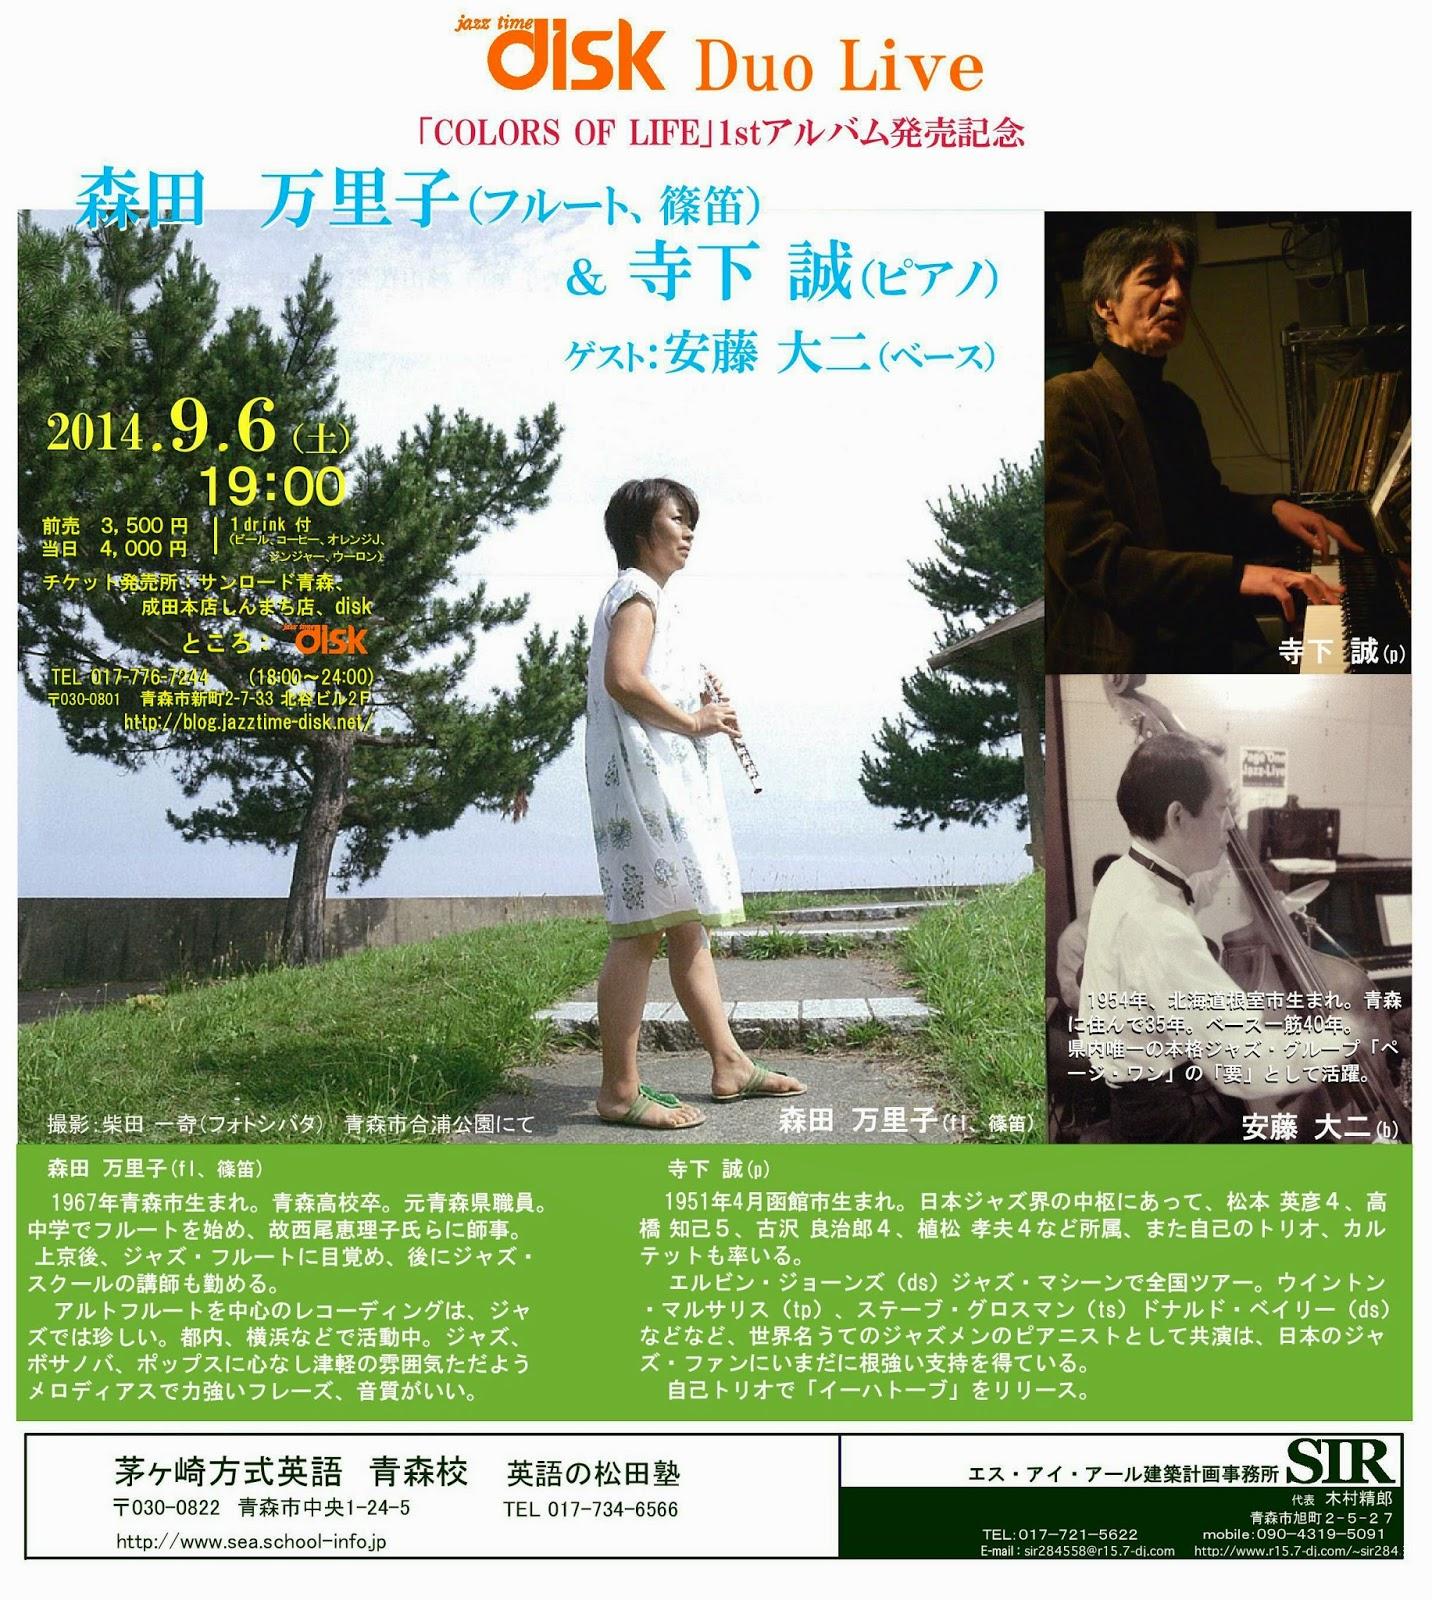 2014/9/6(Sat) 19:00 「森田 万里子(フルート、篠笛) & 寺下 誠(ピアノ) 」Duo Live ゲスト:安藤 大二(ベース)